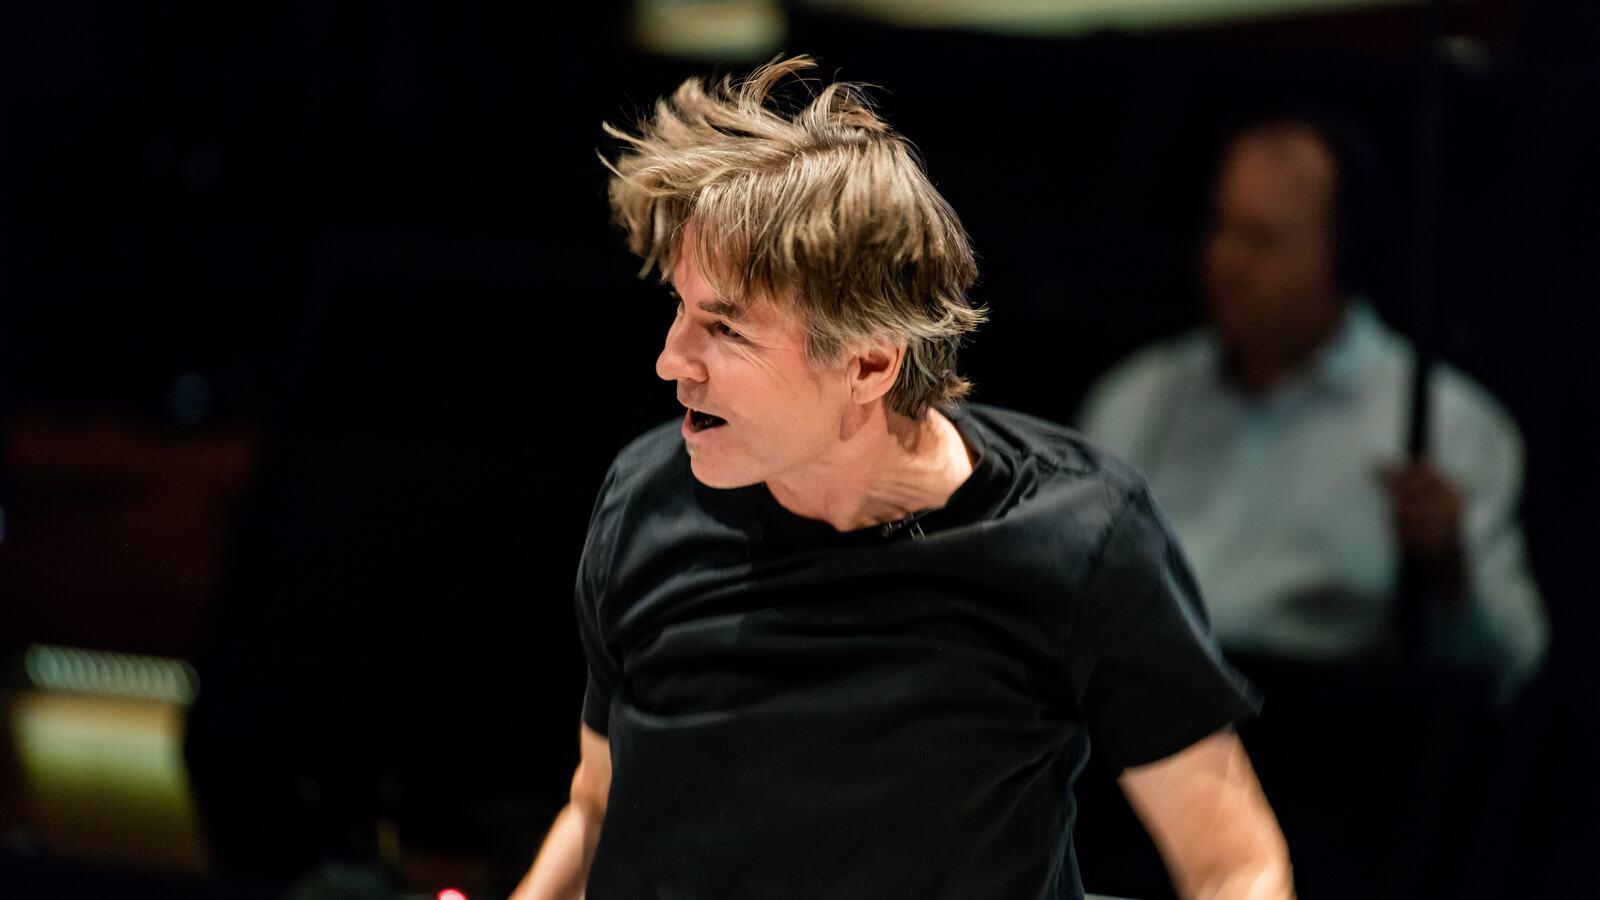 Esa Pekka Salonen, conductor